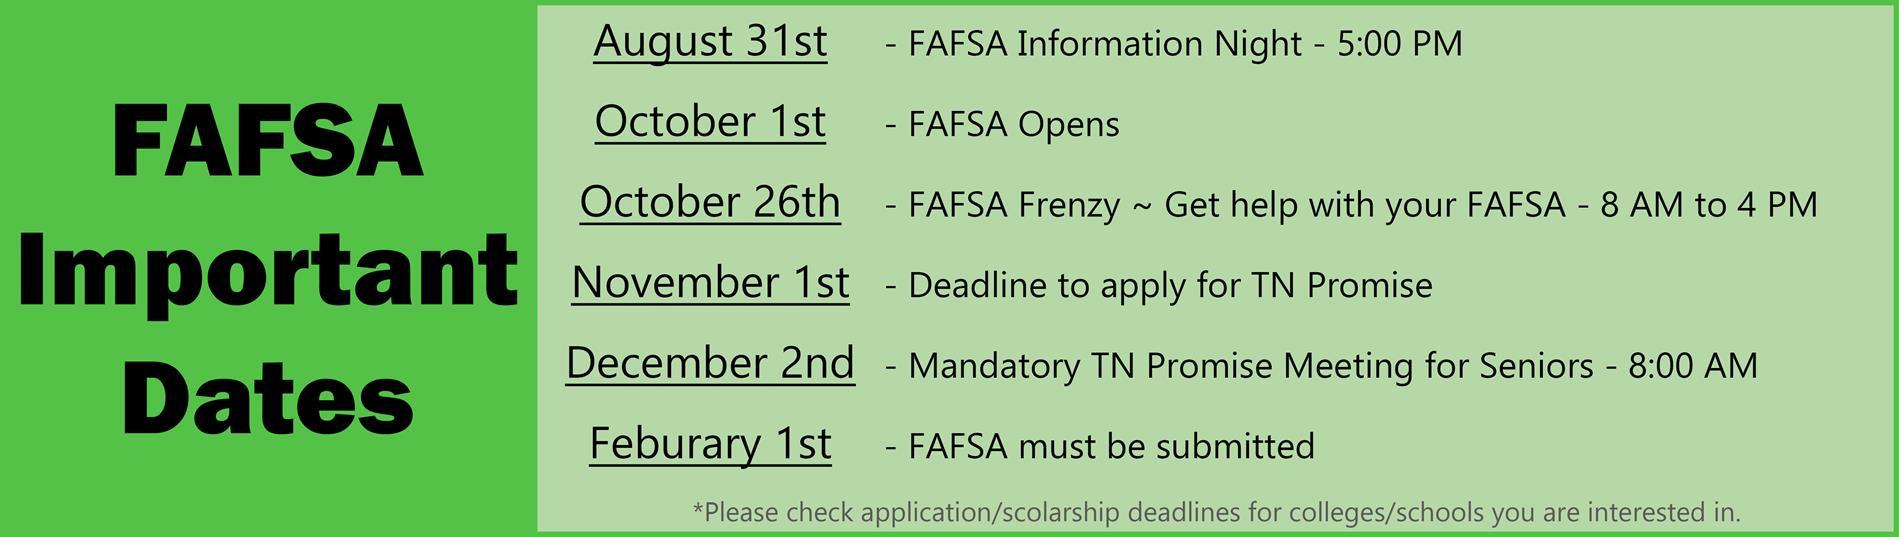 FAFSA Important Dates